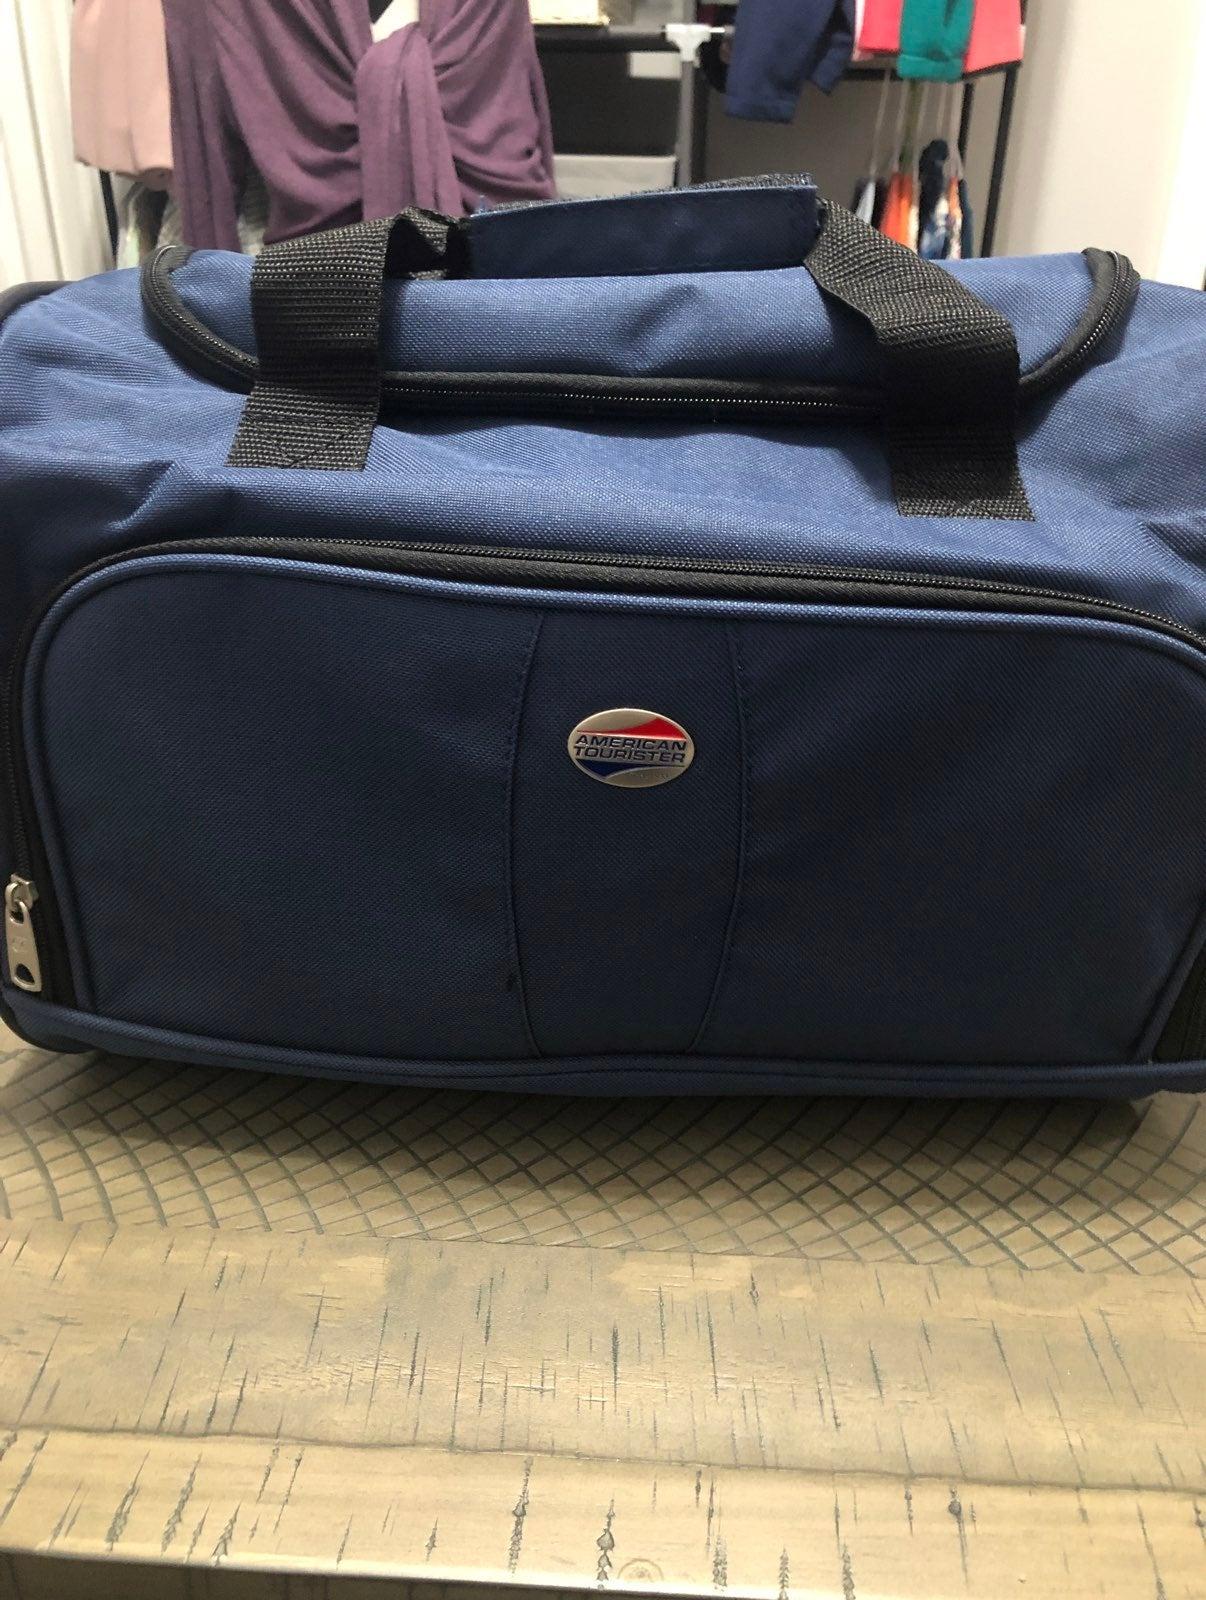 American Tourister Bag blue carry on bag